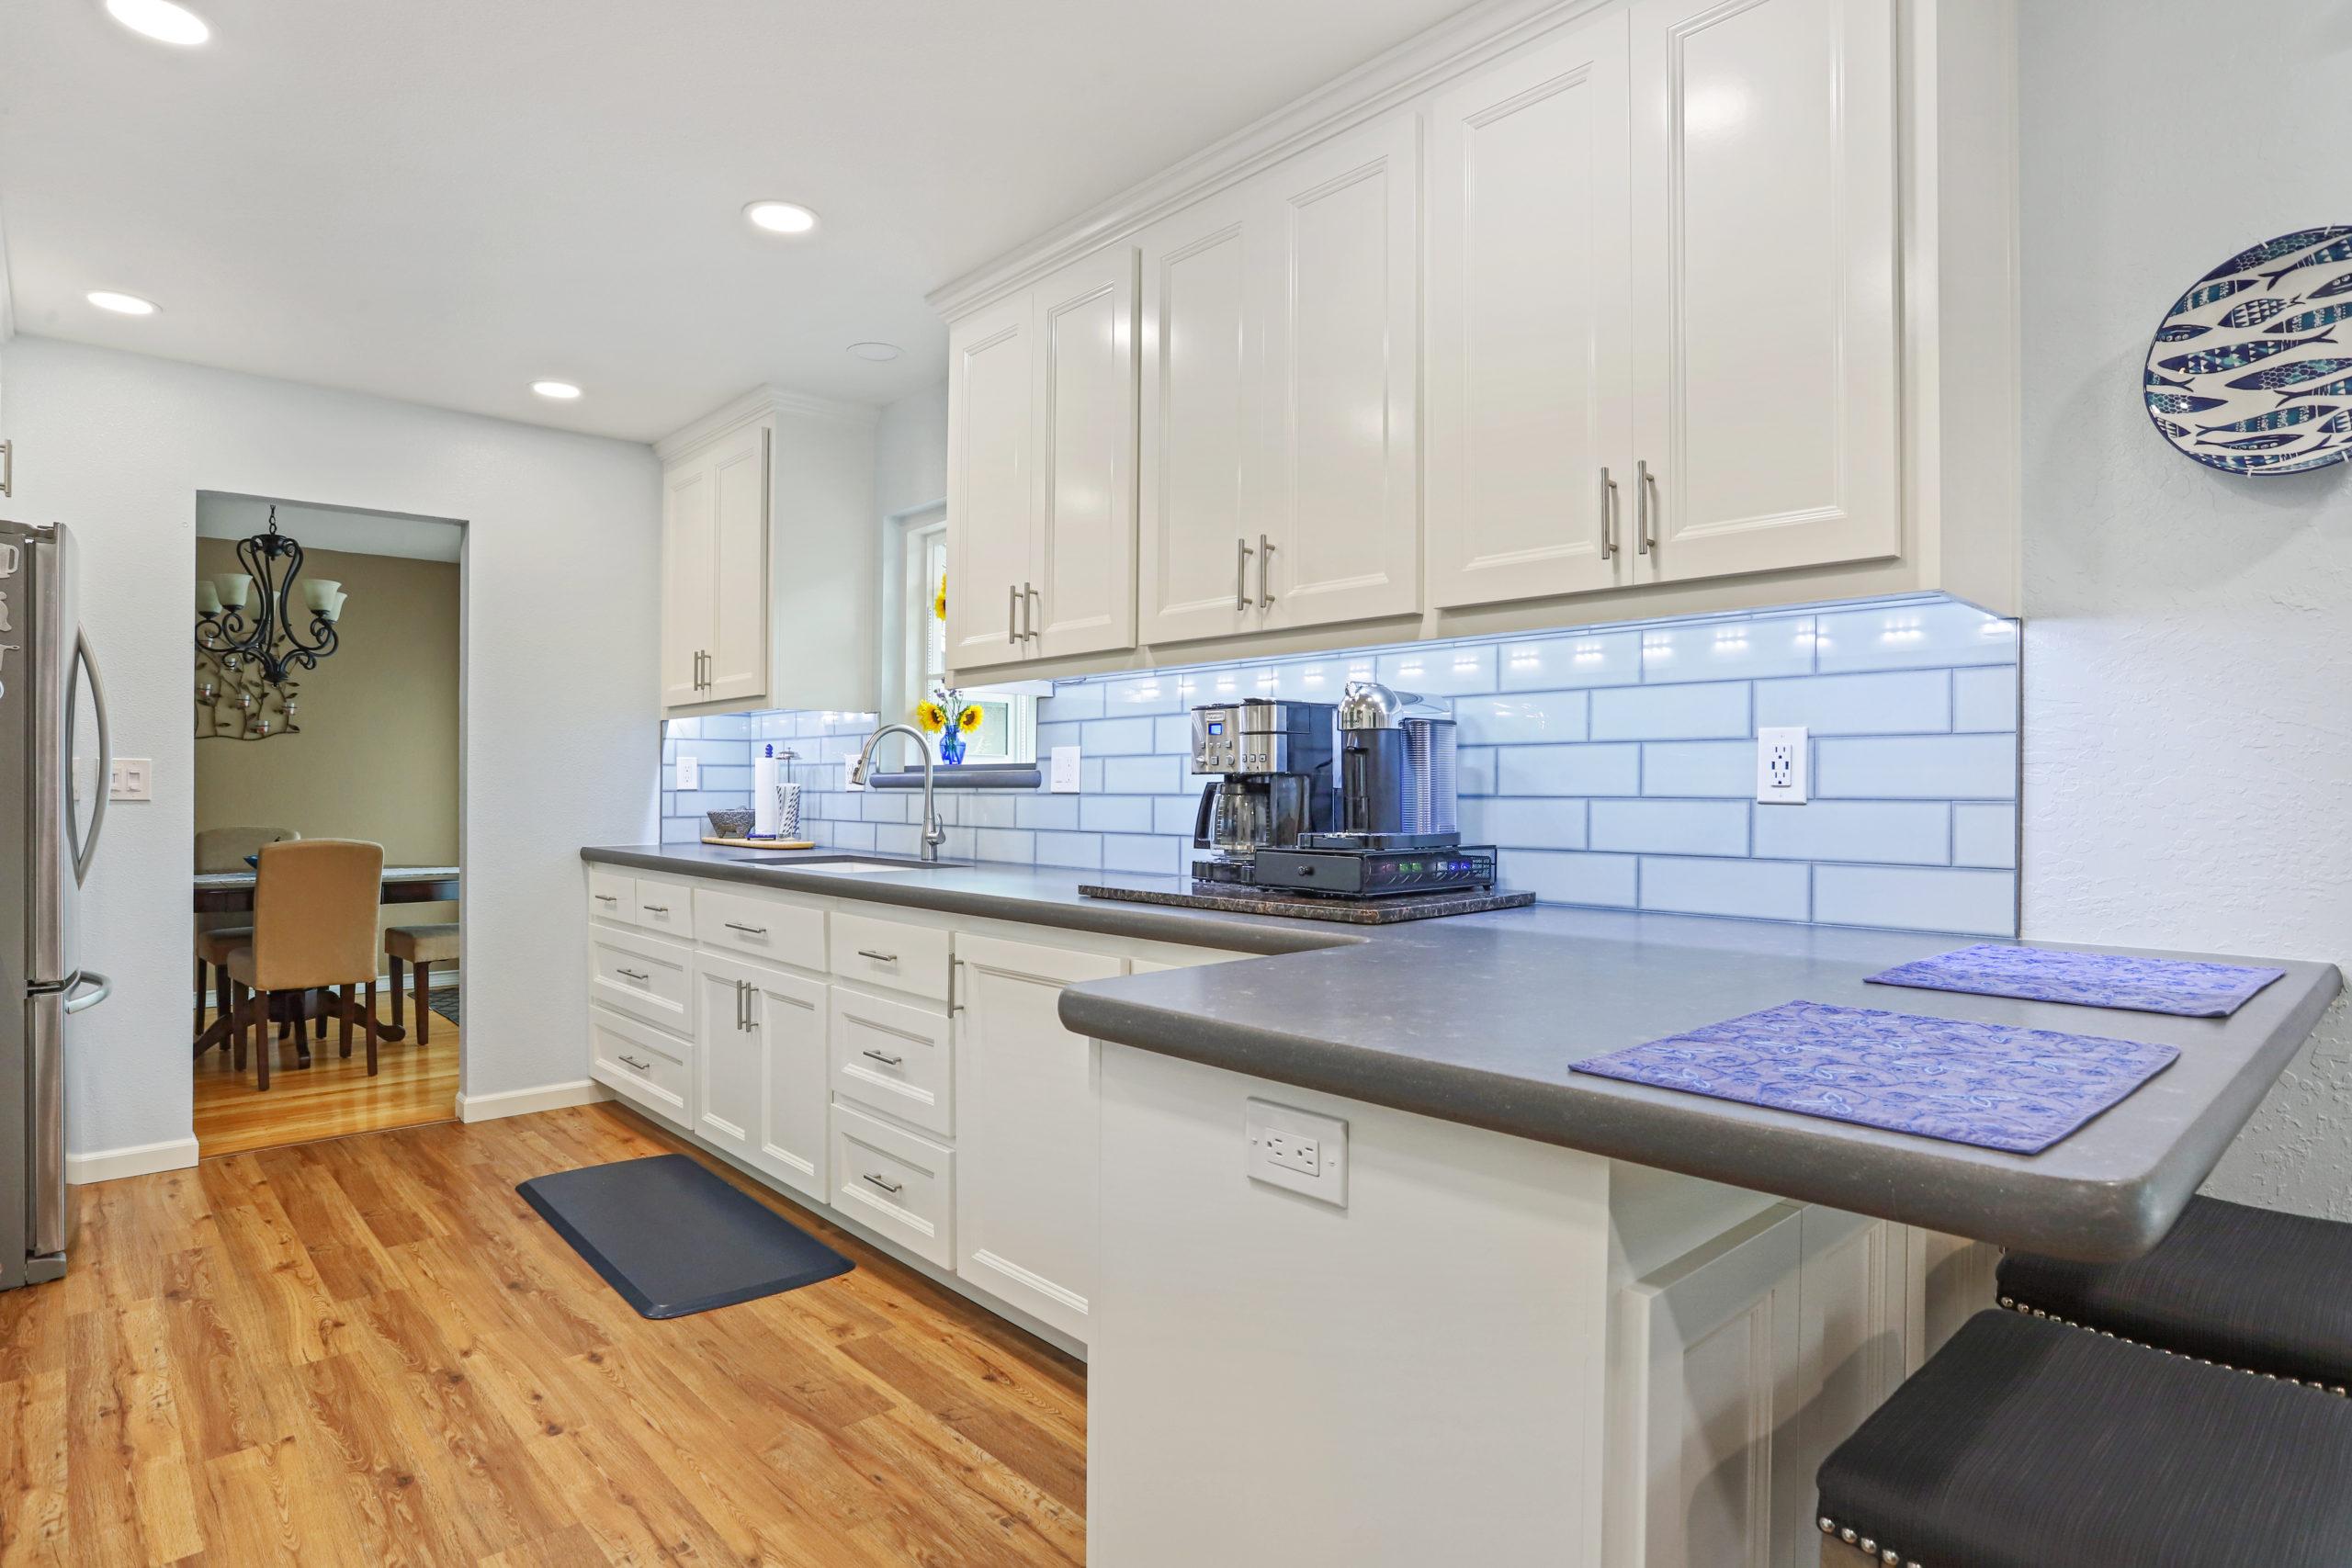 custom kitchen remodel in livermore